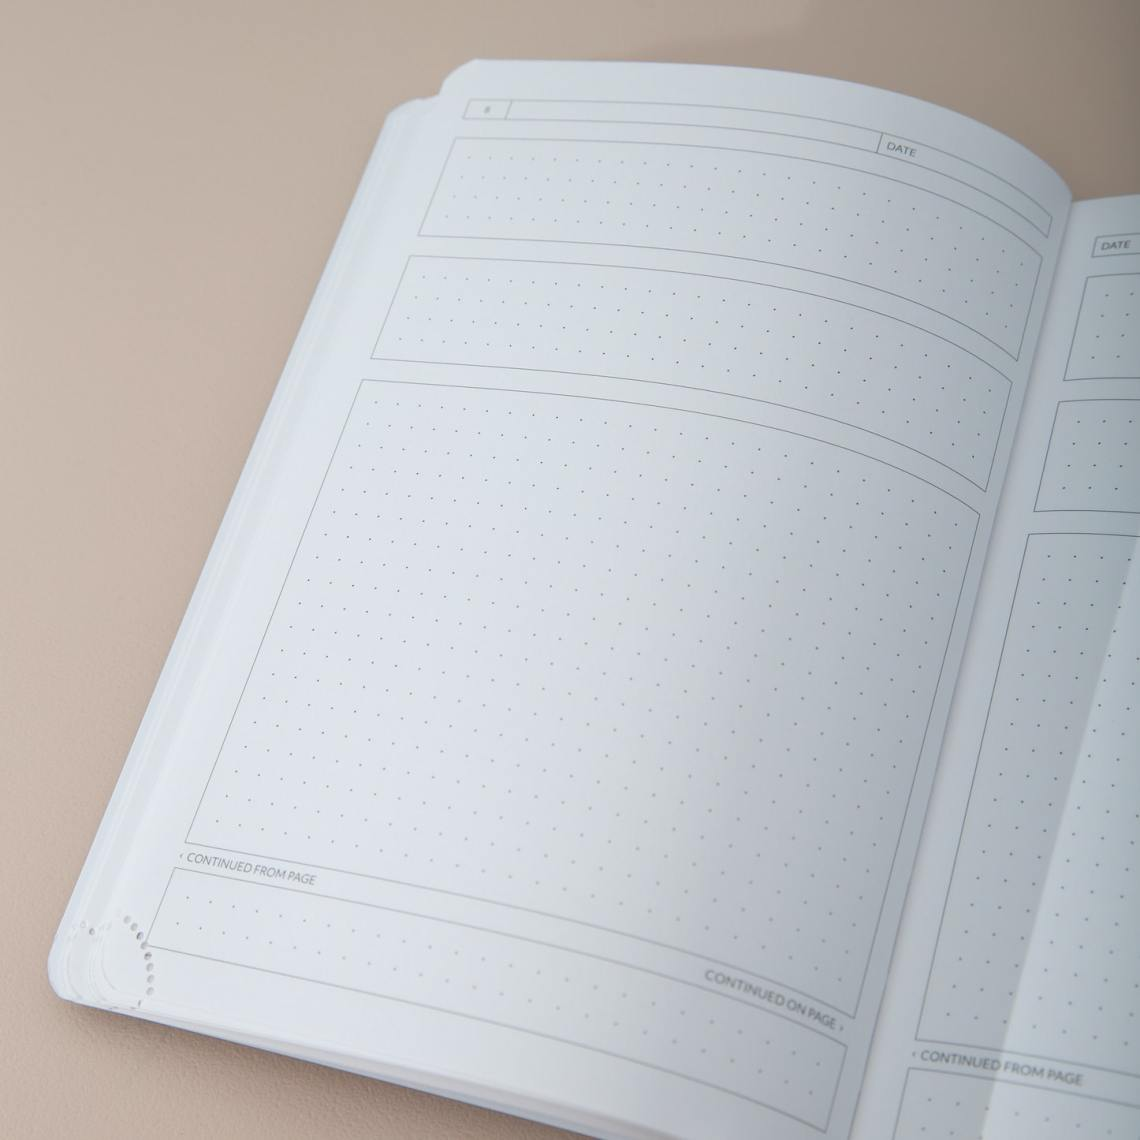 Theme System Journal interior spread